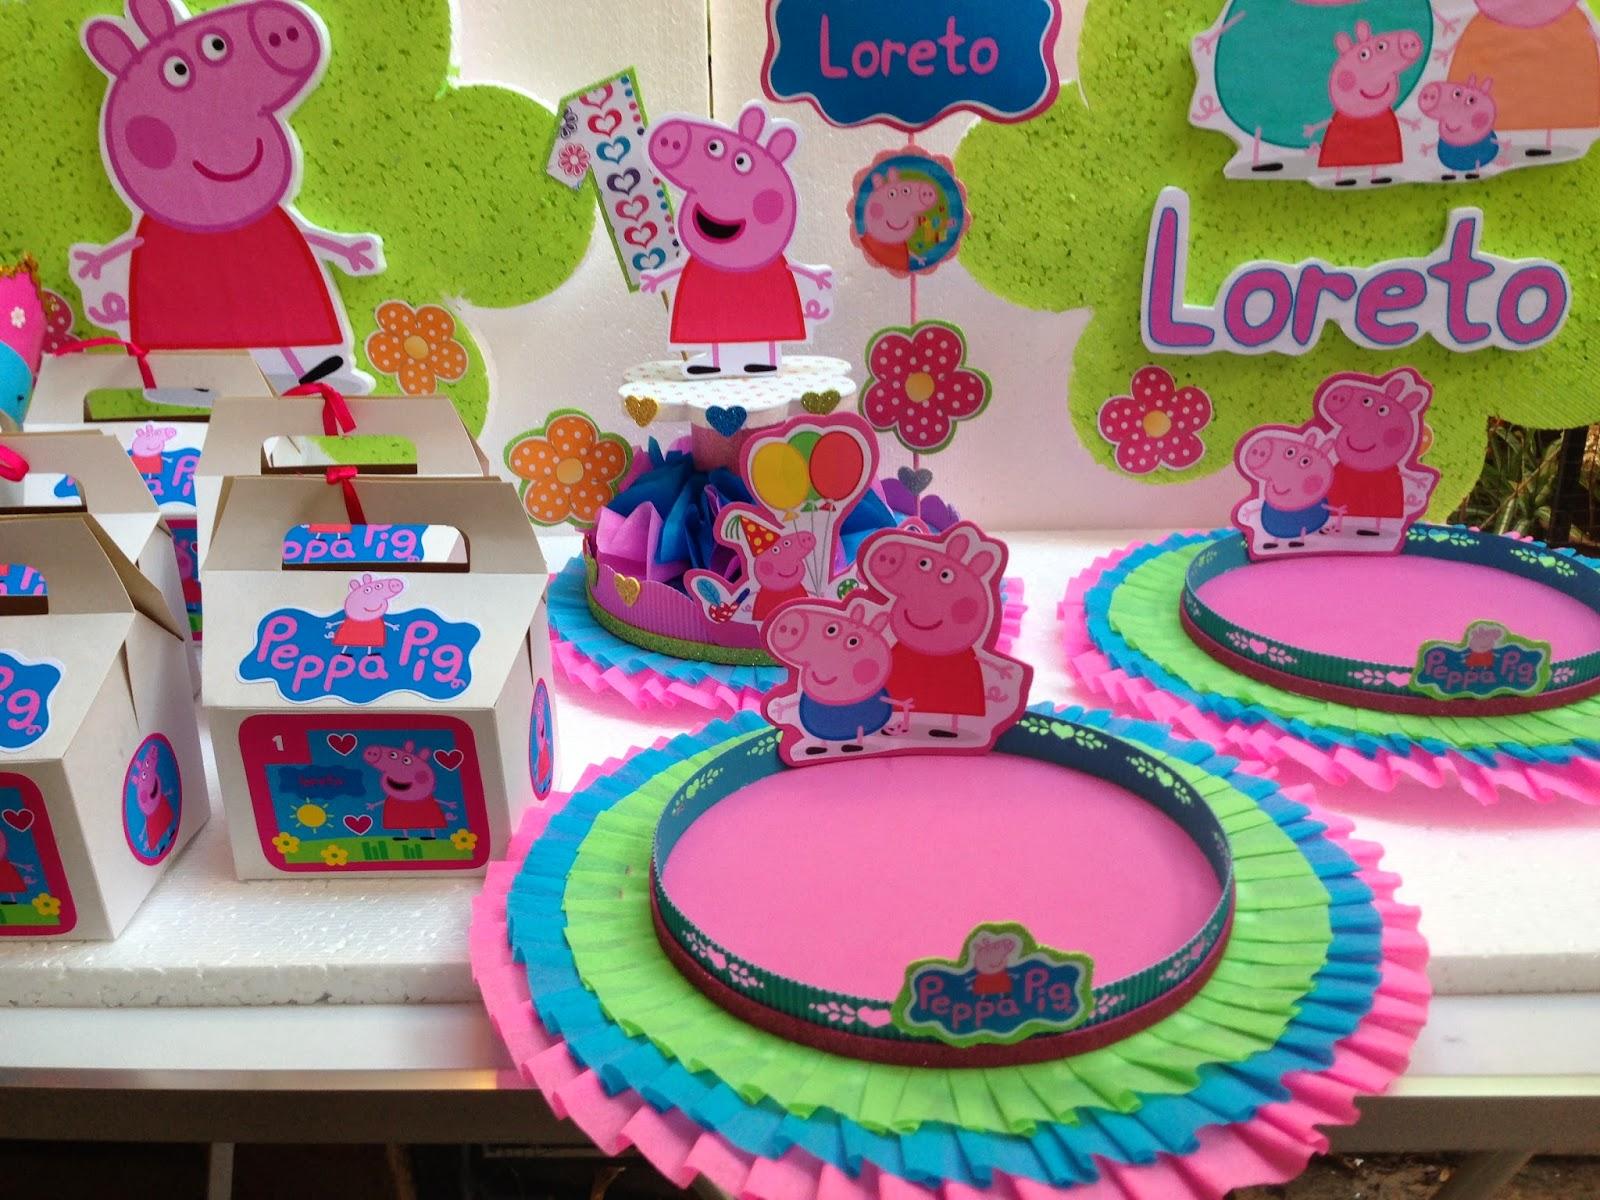 Decoracin de fiestas infantiles de peppa decoraciones for Decoraciones infantiles